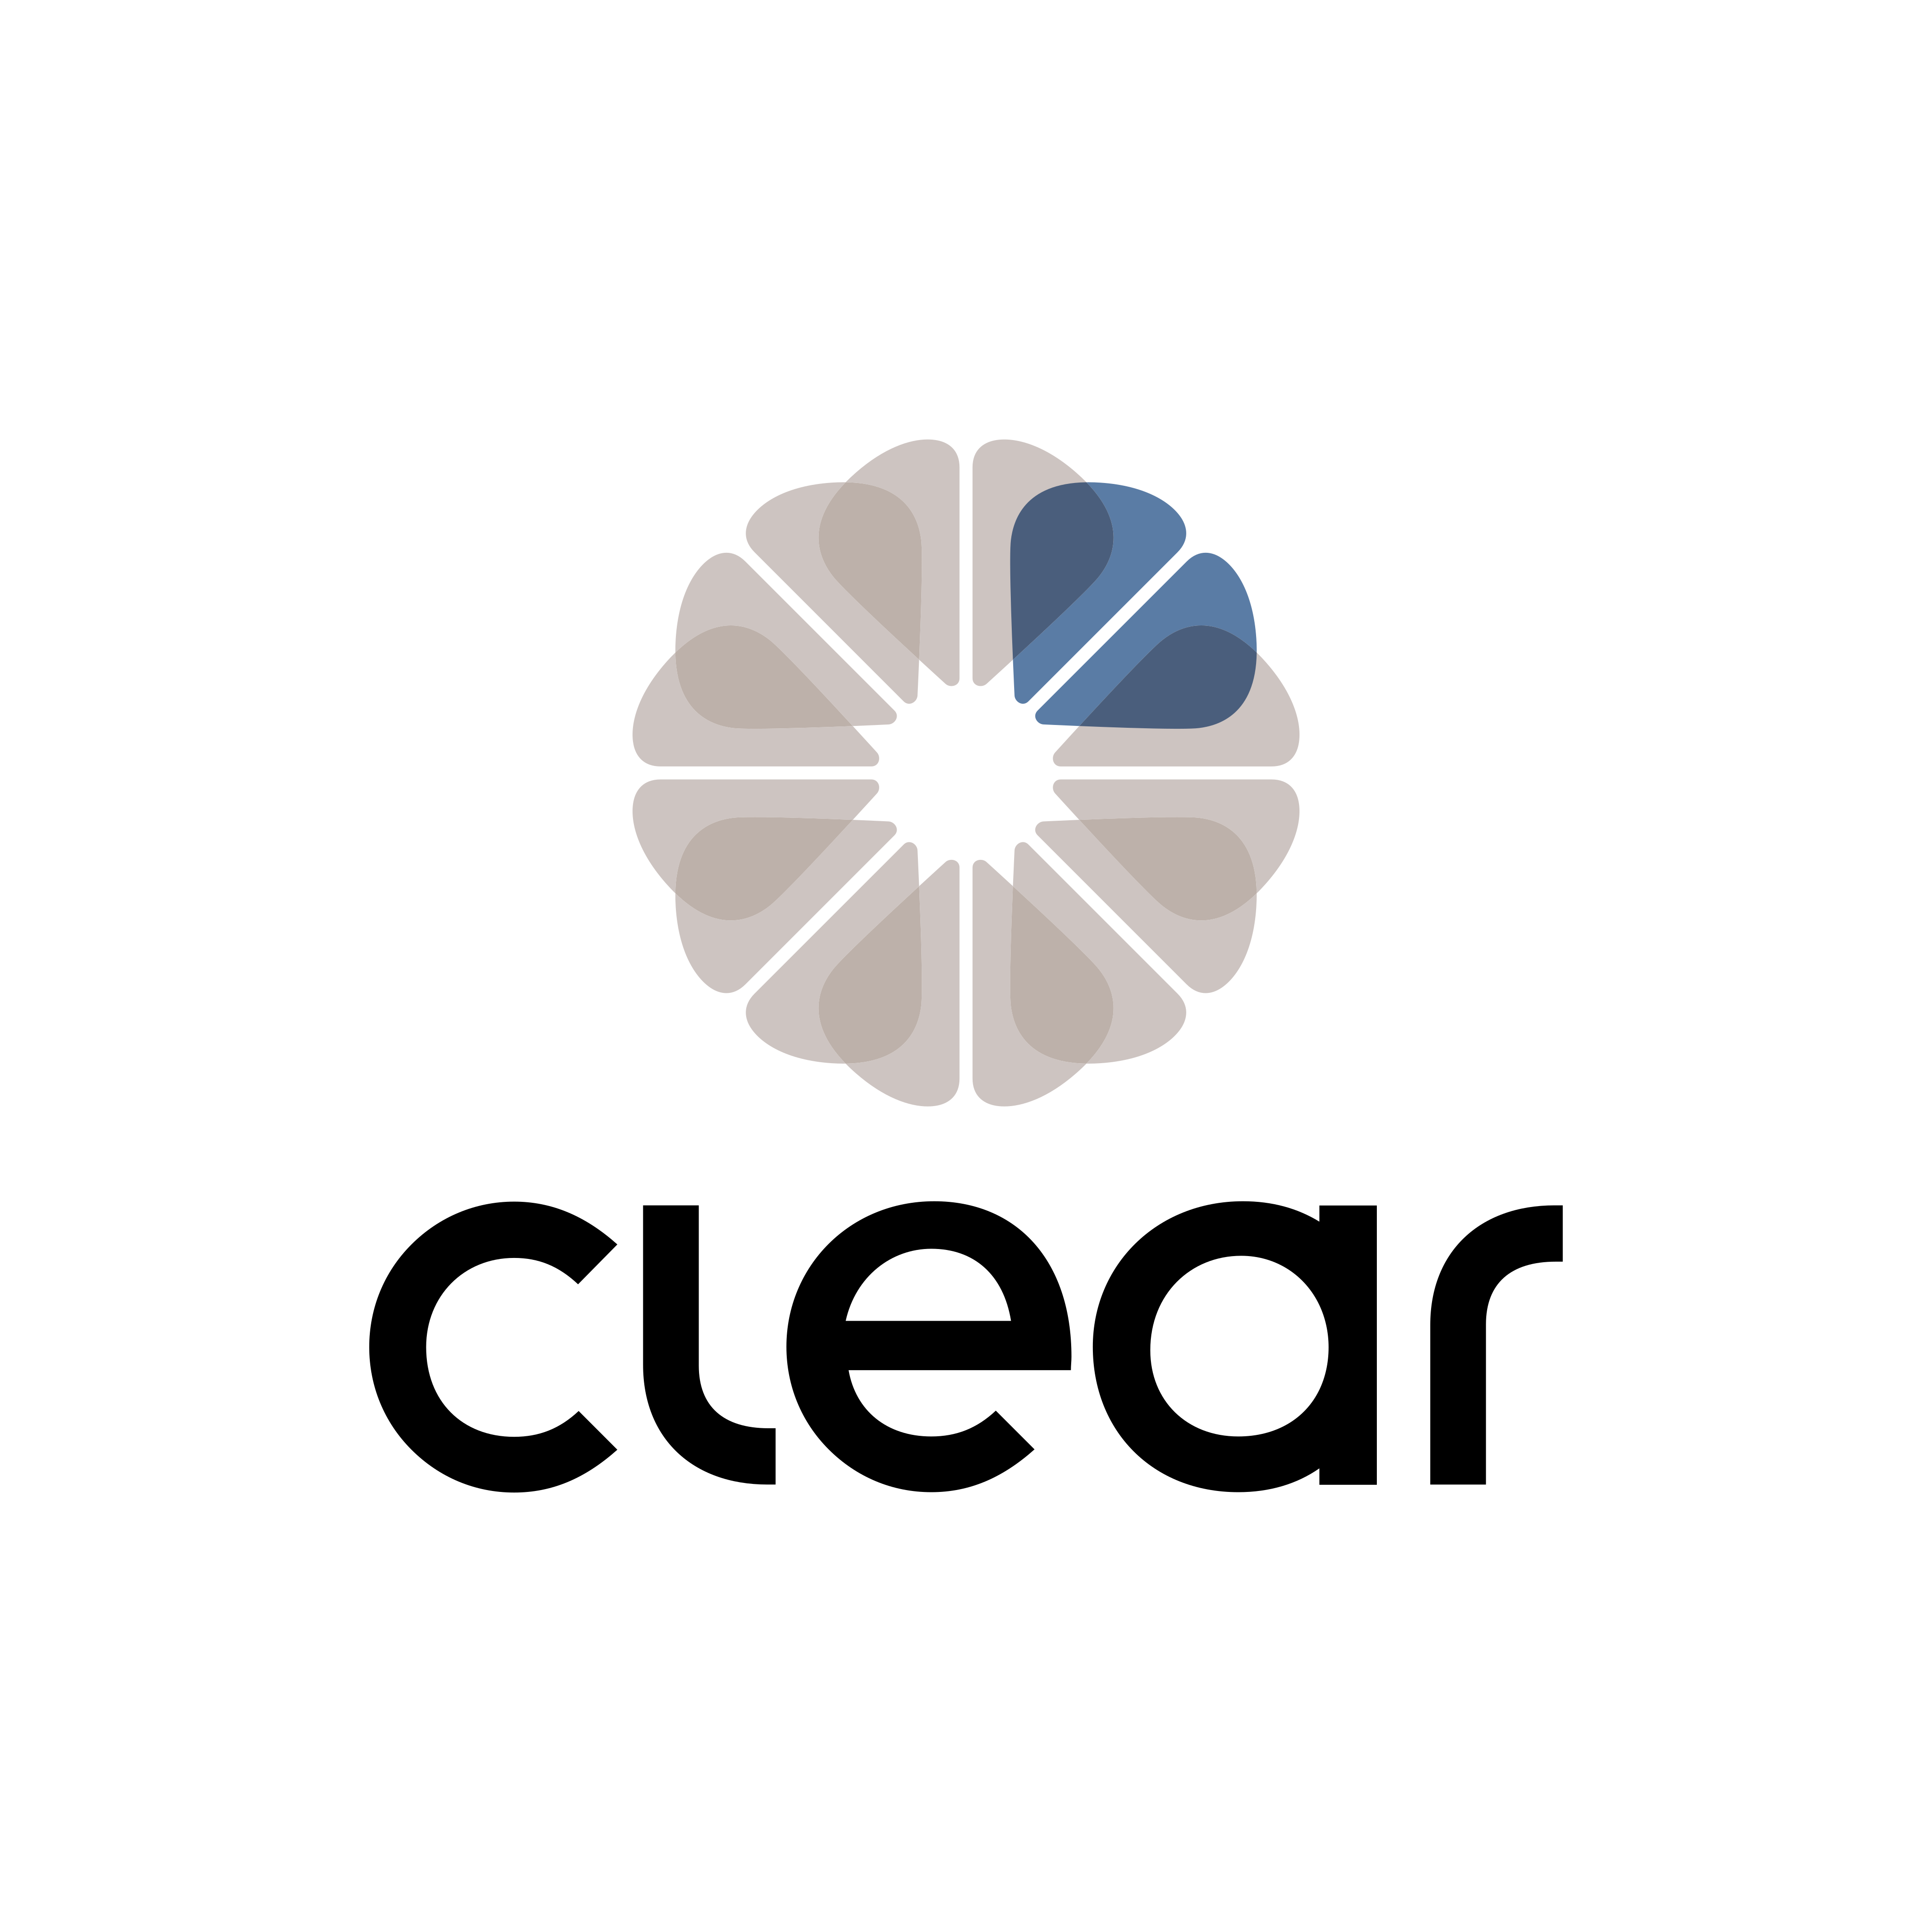 Clear Corretora Logo PNG.